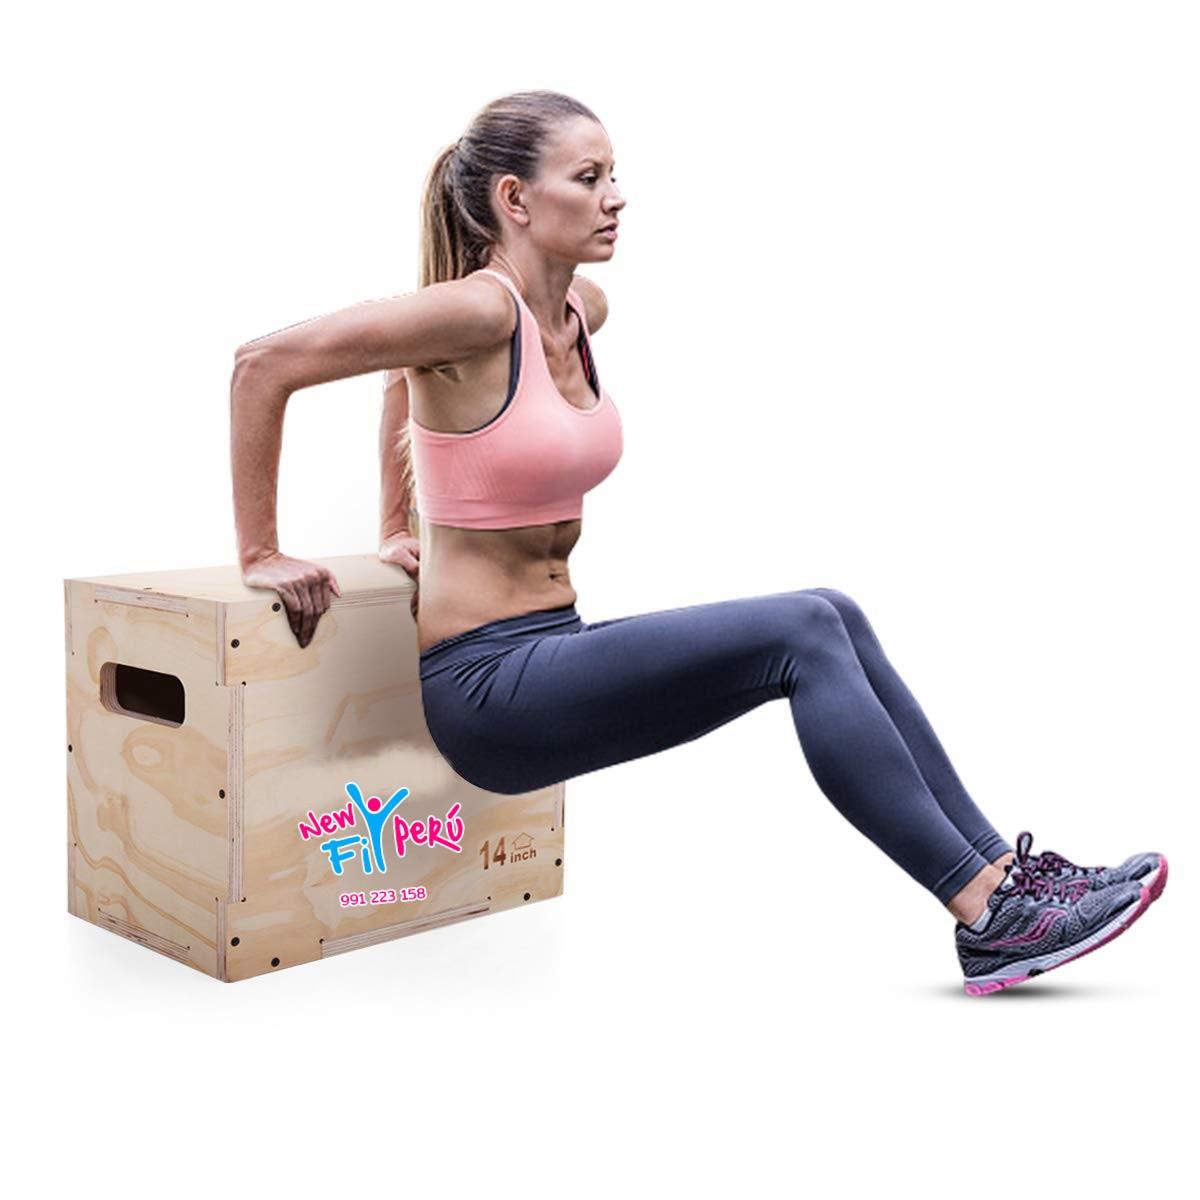 Caja Crossfit Para Salto Box Jump Pliométrico 3 Alturas En 1